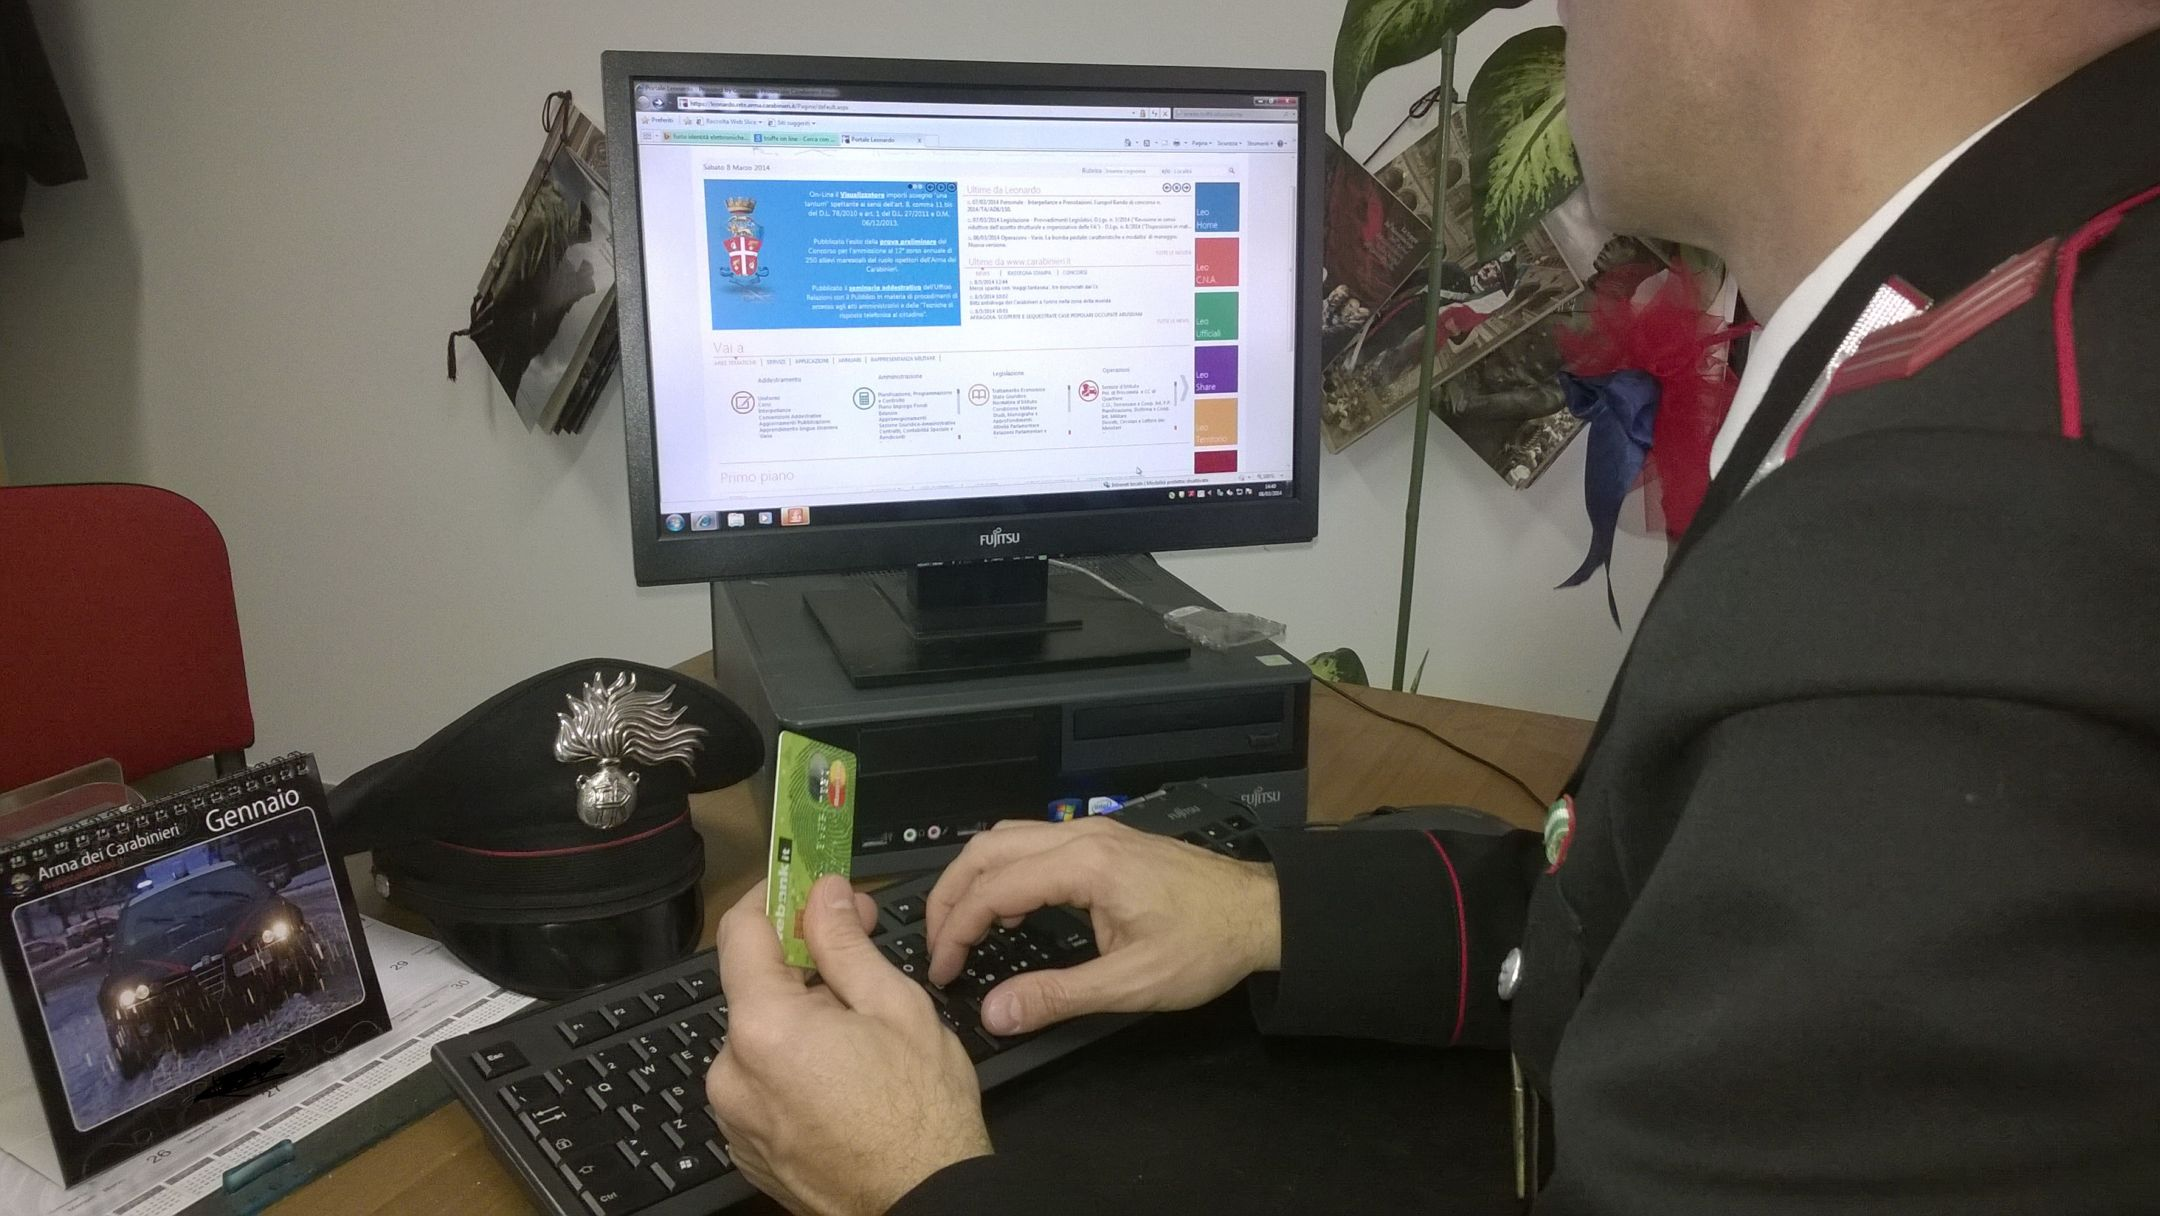 Carabinieri impegnati a scoprire truffe online